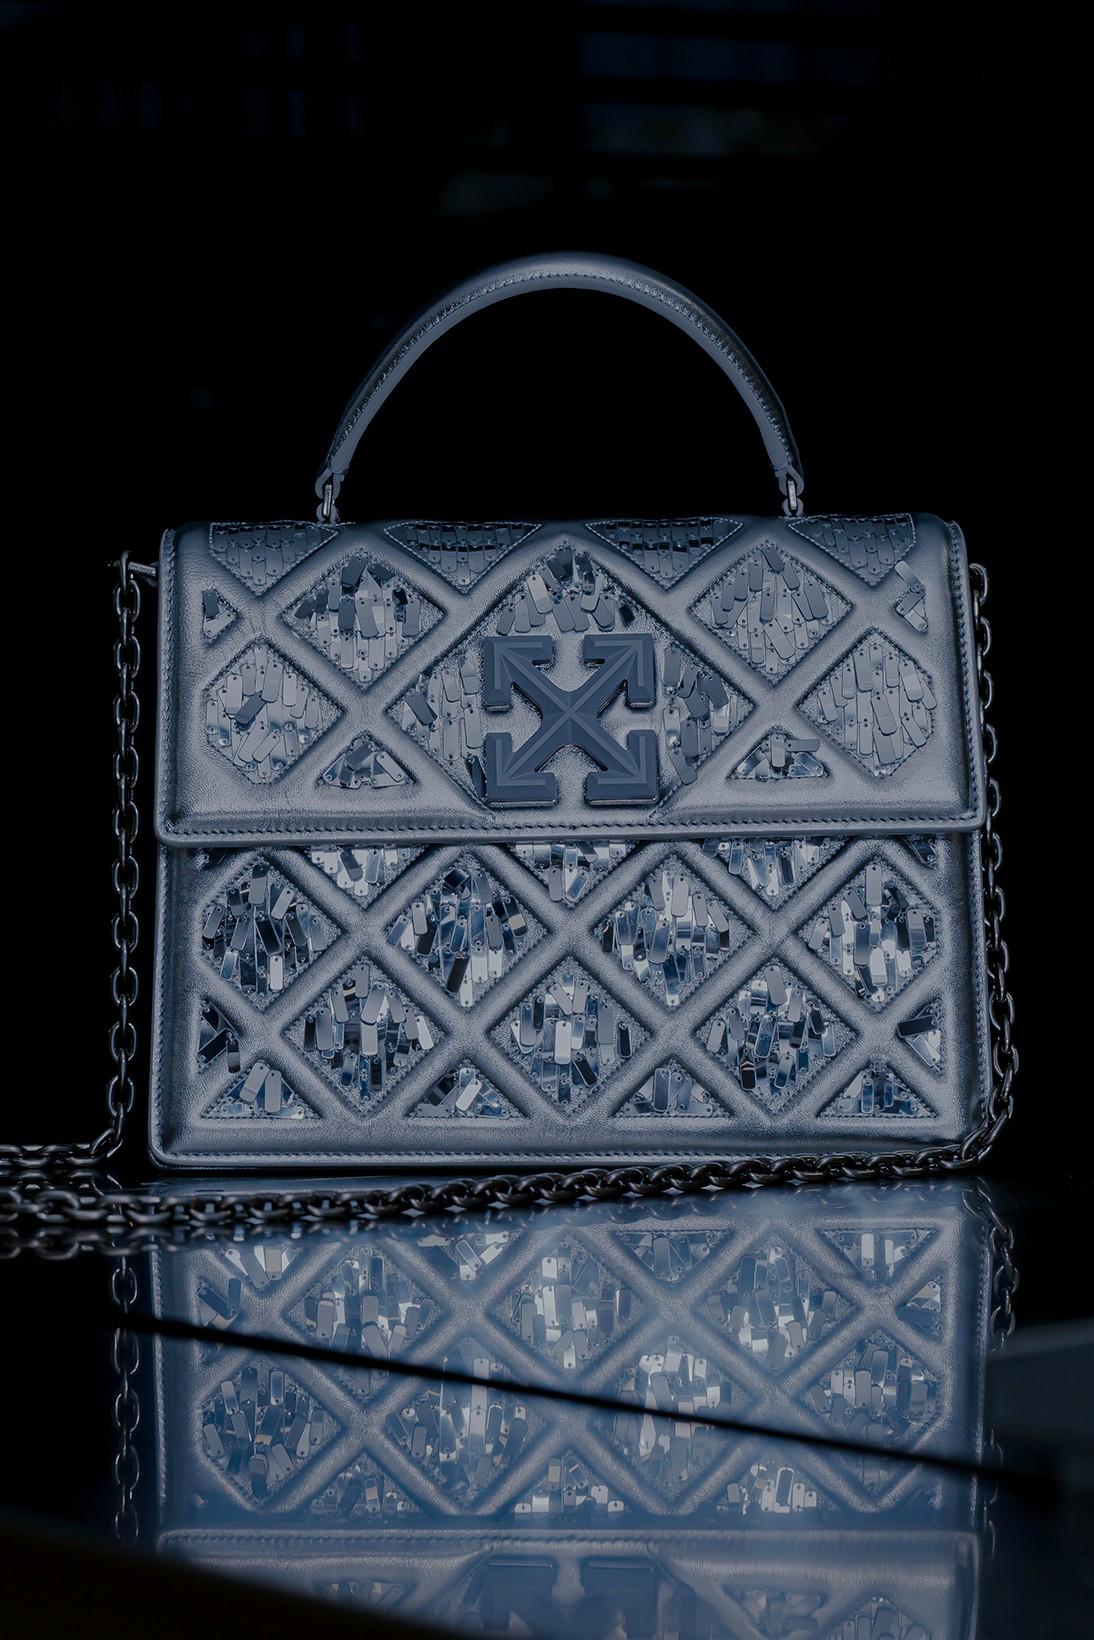 Вирджил Абло сделал для Off-White сумку, вдохновленную пирамидой Лувра (фото 1)